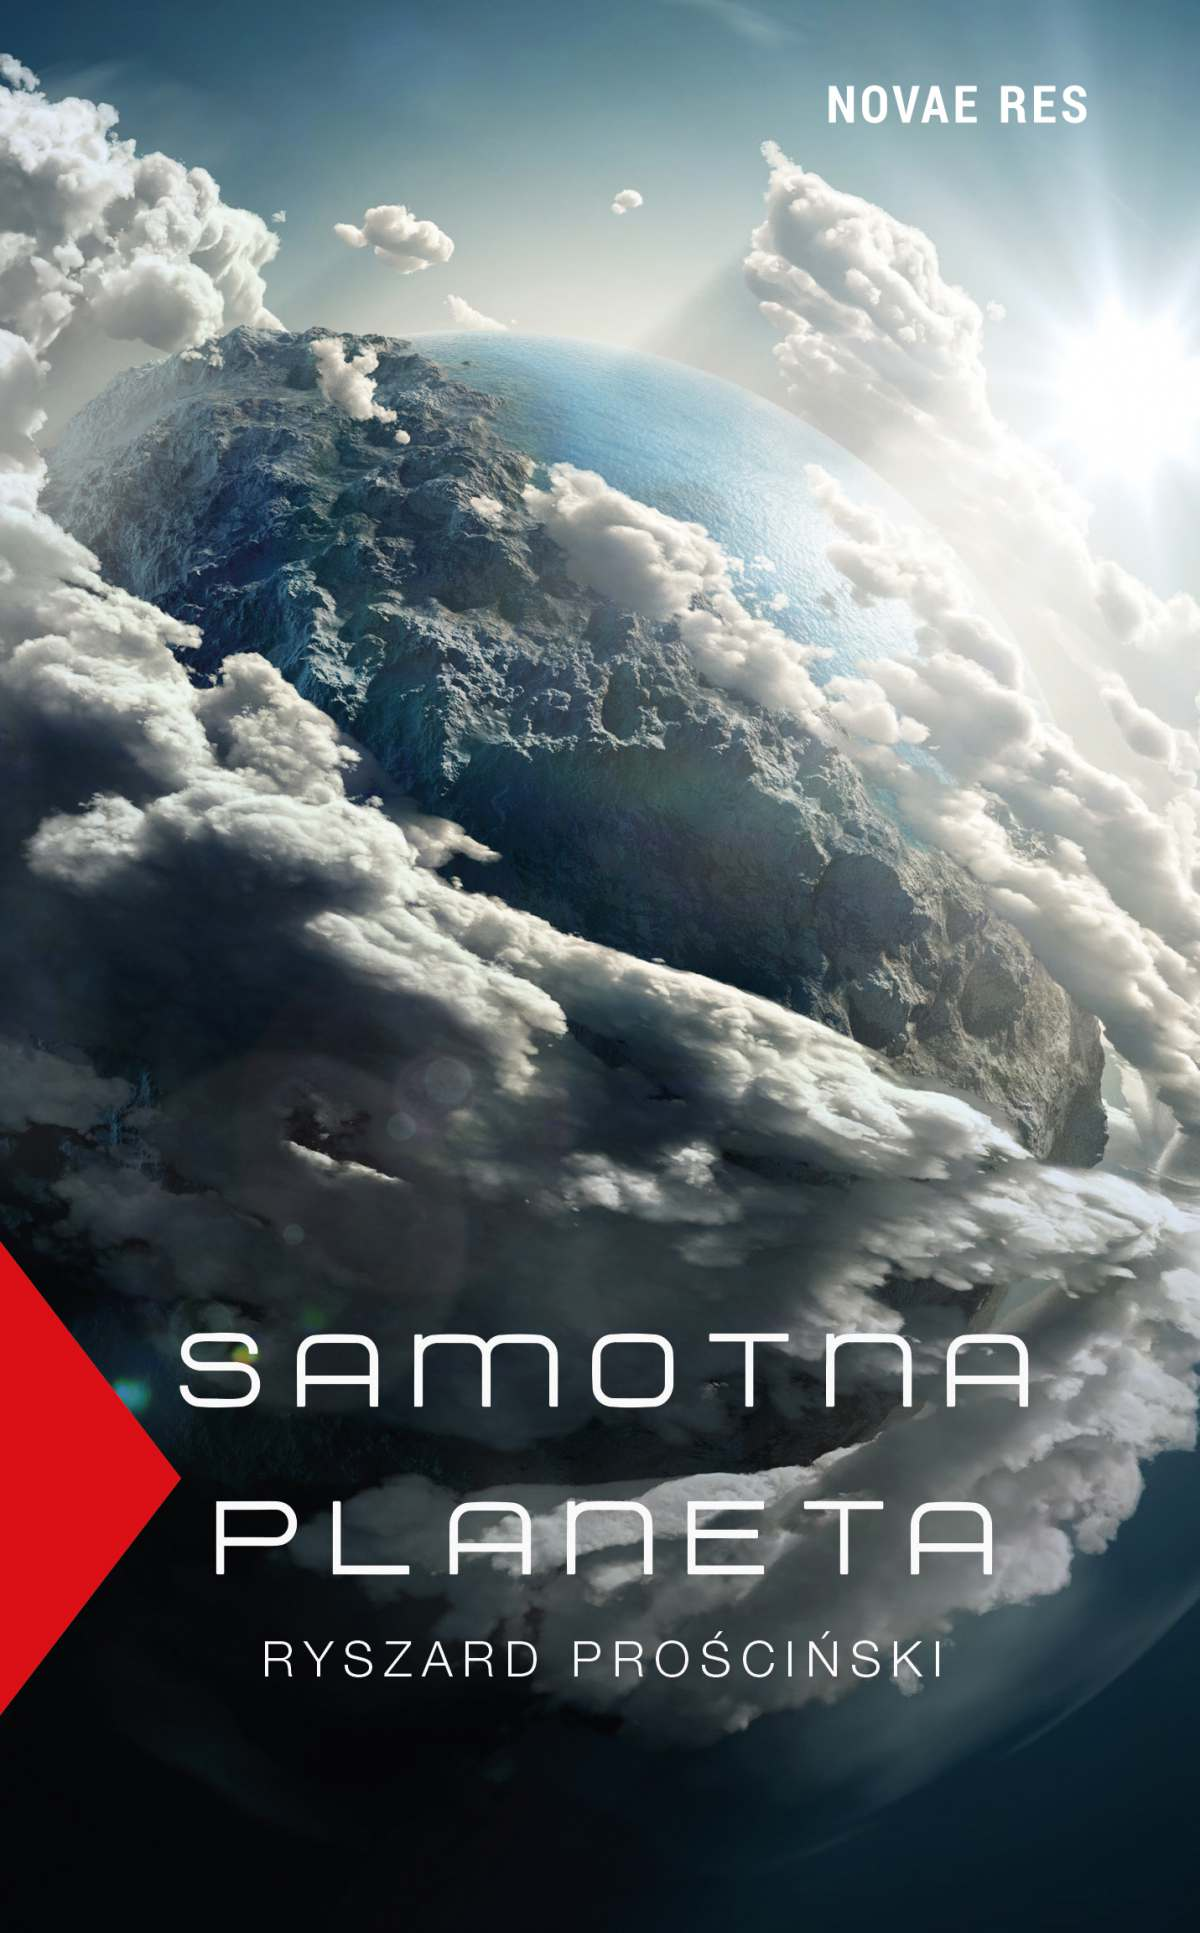 Samotna planeta - Ebook (Książka EPUB) do pobrania w formacie EPUB